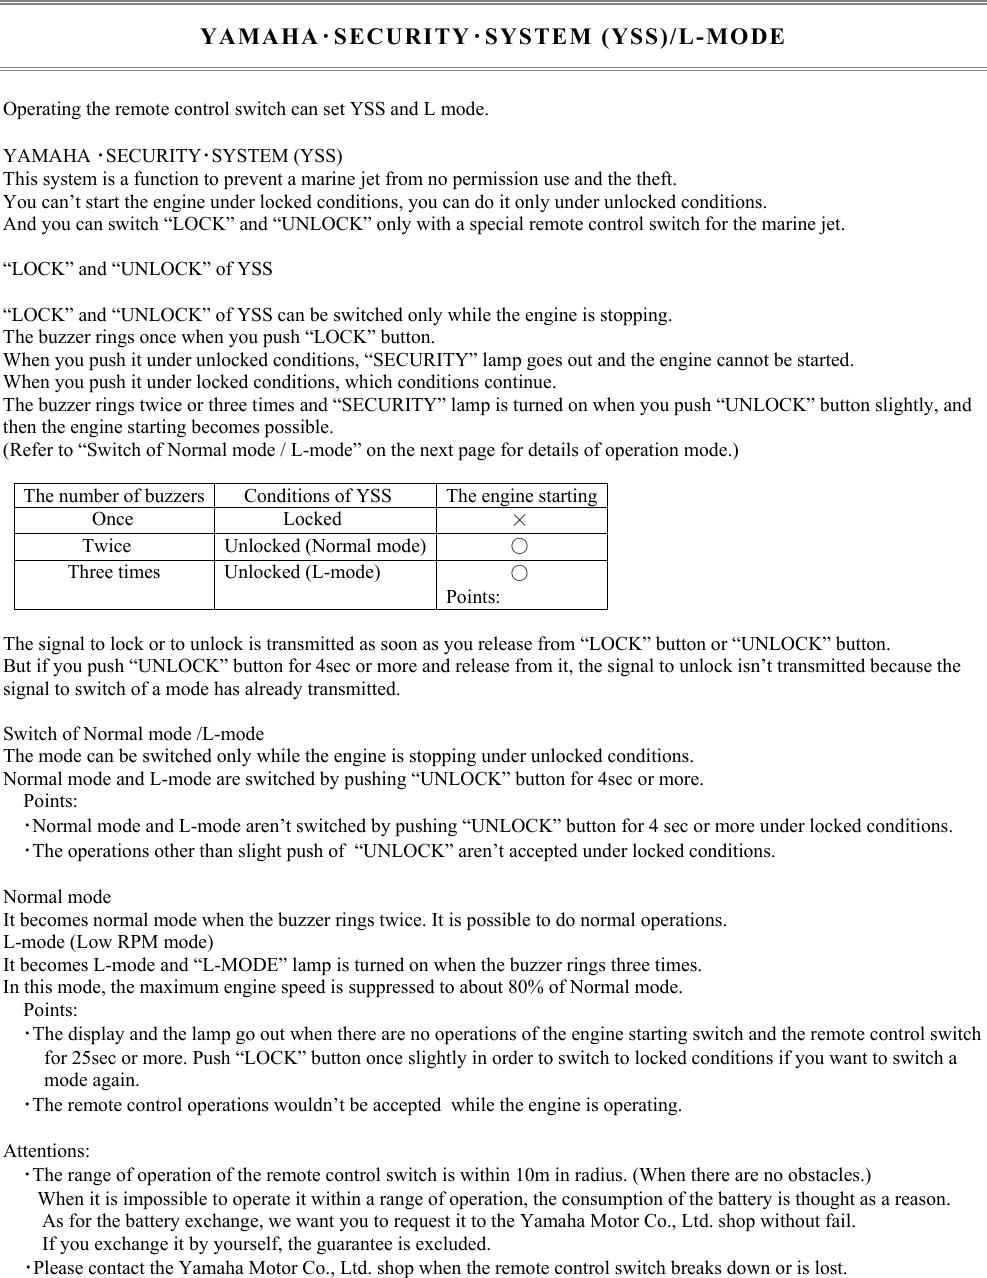 Mitsubishi electric f8t732skea5s01 securityremote control mitsubishi electric f8t732skea5s01 securityremote control transmitter user manual 383250 buycottarizona Choice Image